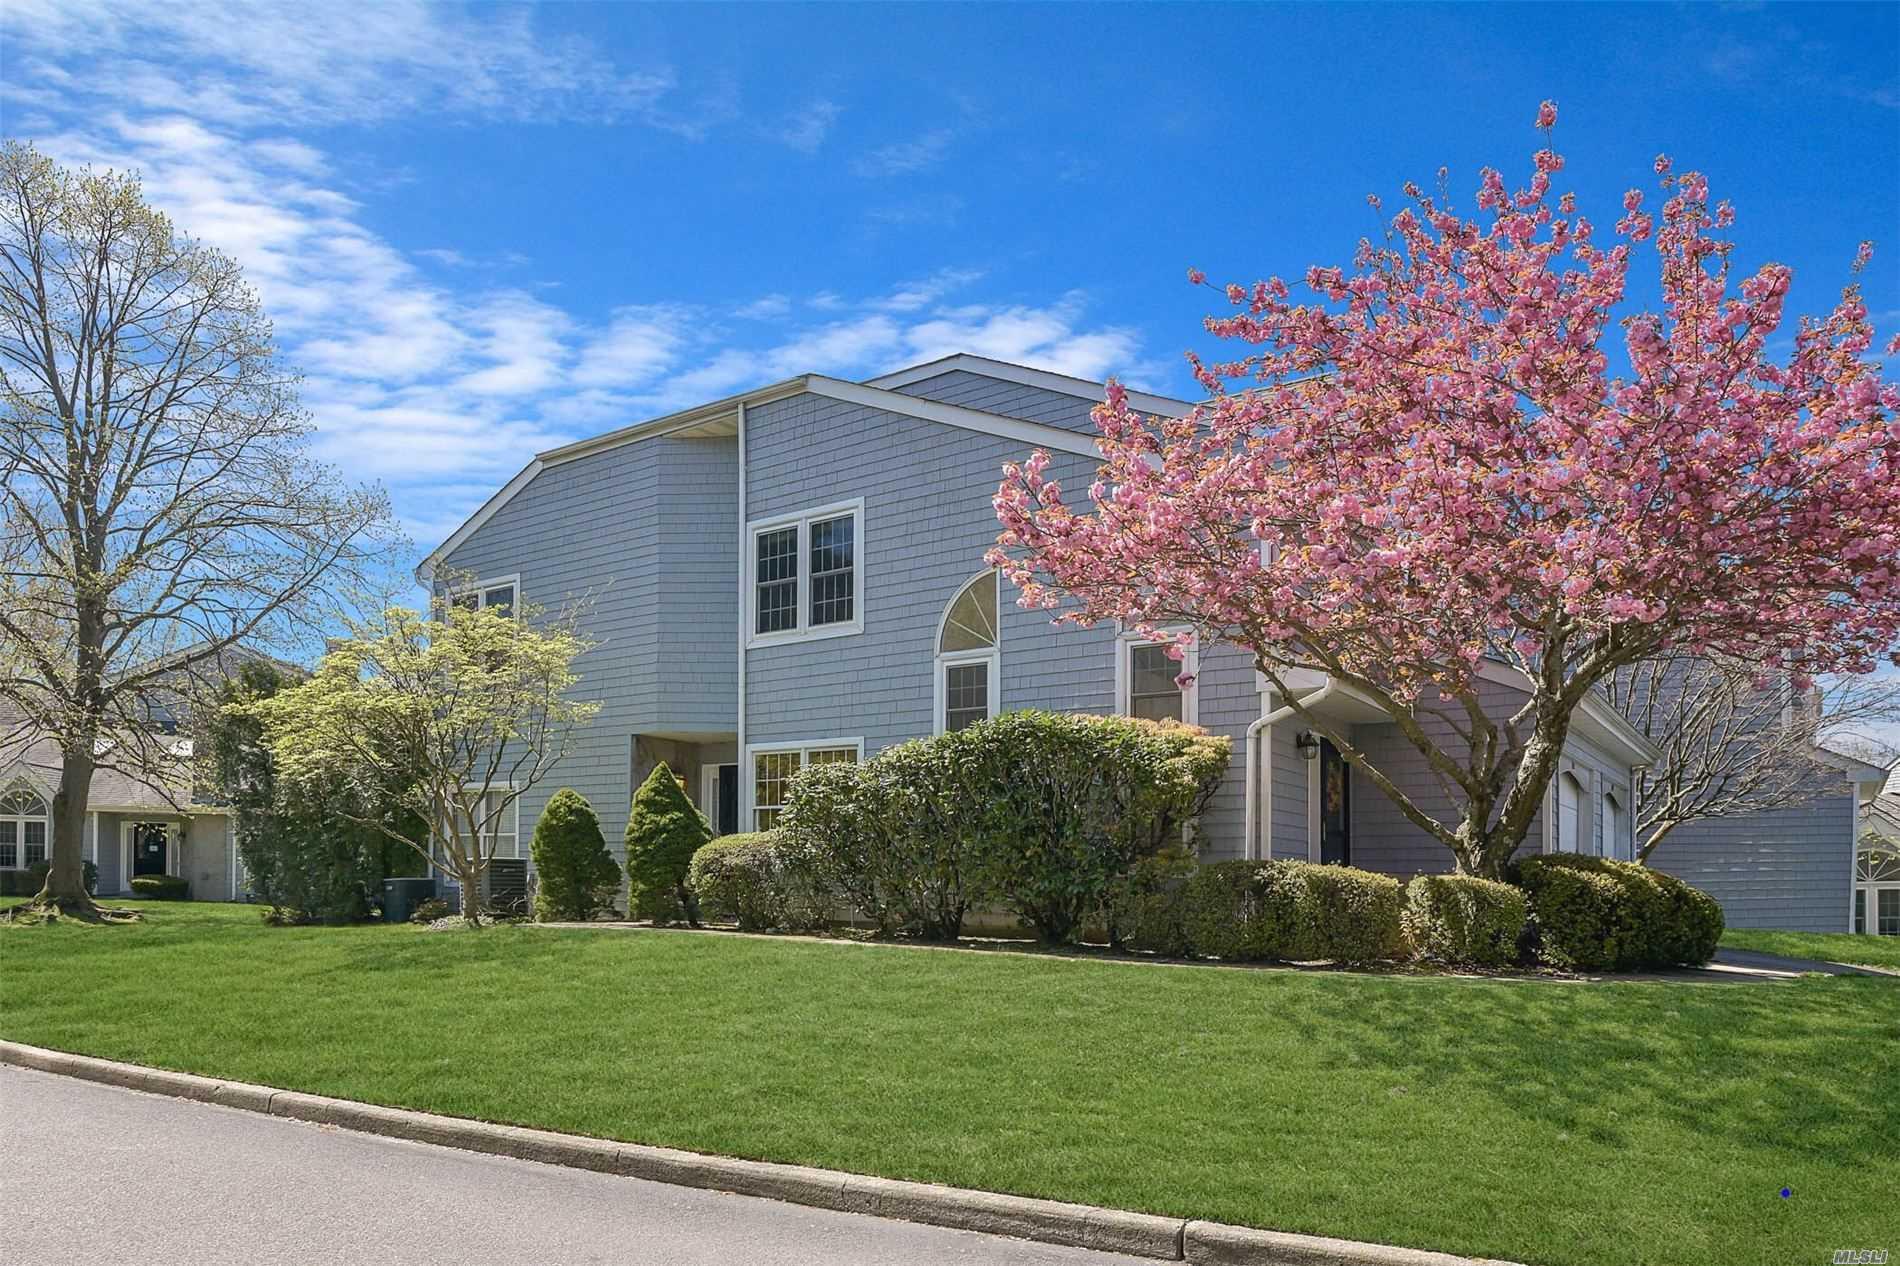 Property for sale at 148 Lakebridge Dr, Kings Park NY 11754, Kings Park,  New York 11754